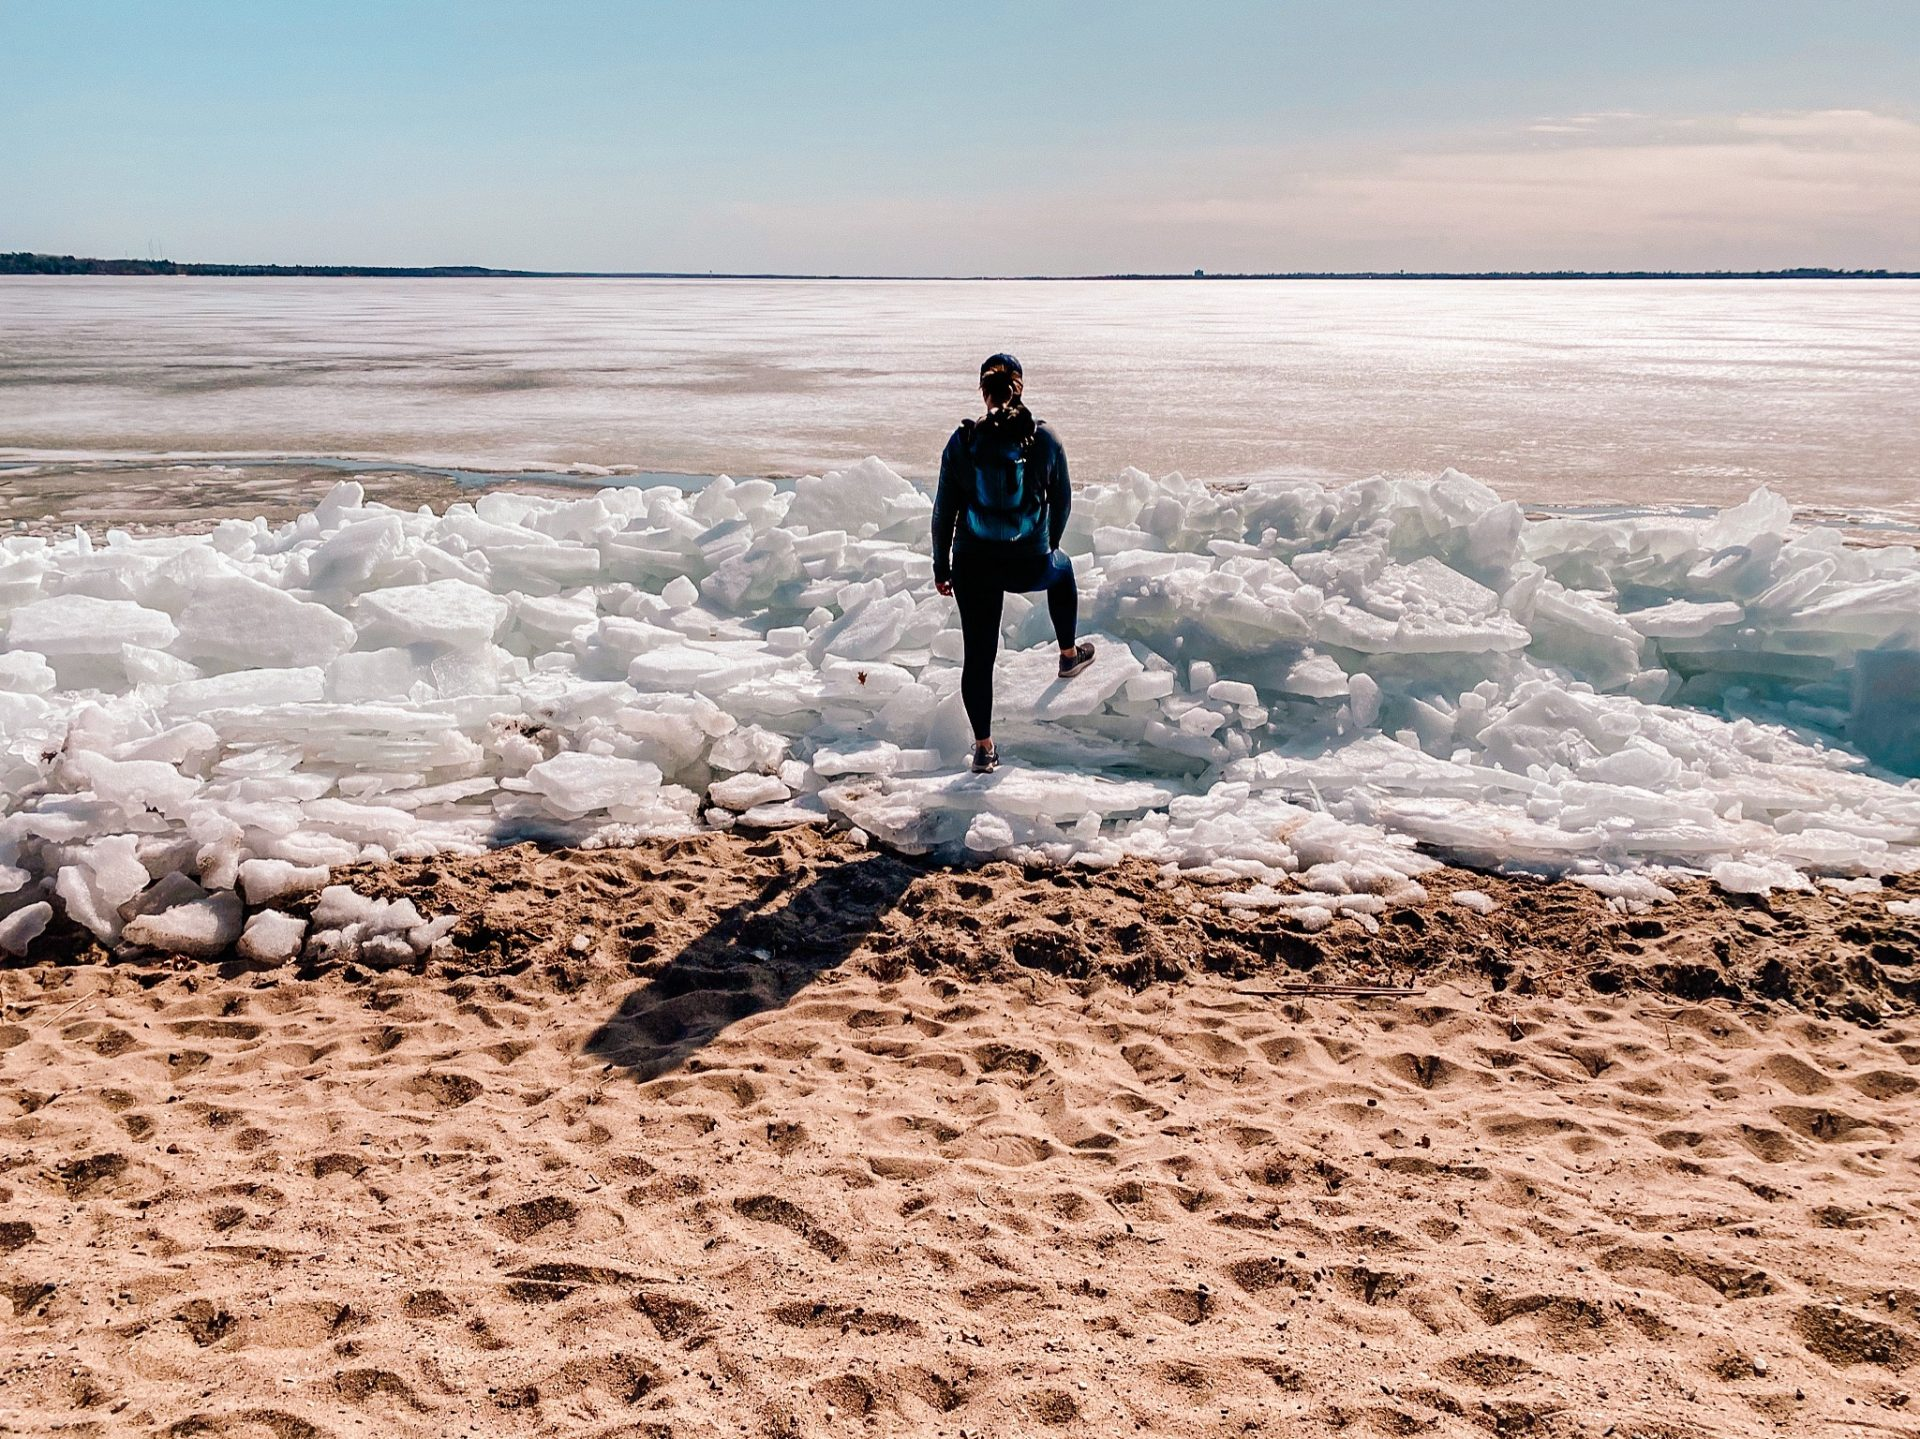 Ice coming off of Lake Bemidji in Minnesota at Lake Bemidji State Park. Woman standing on the ice shards along the lake shore sand.